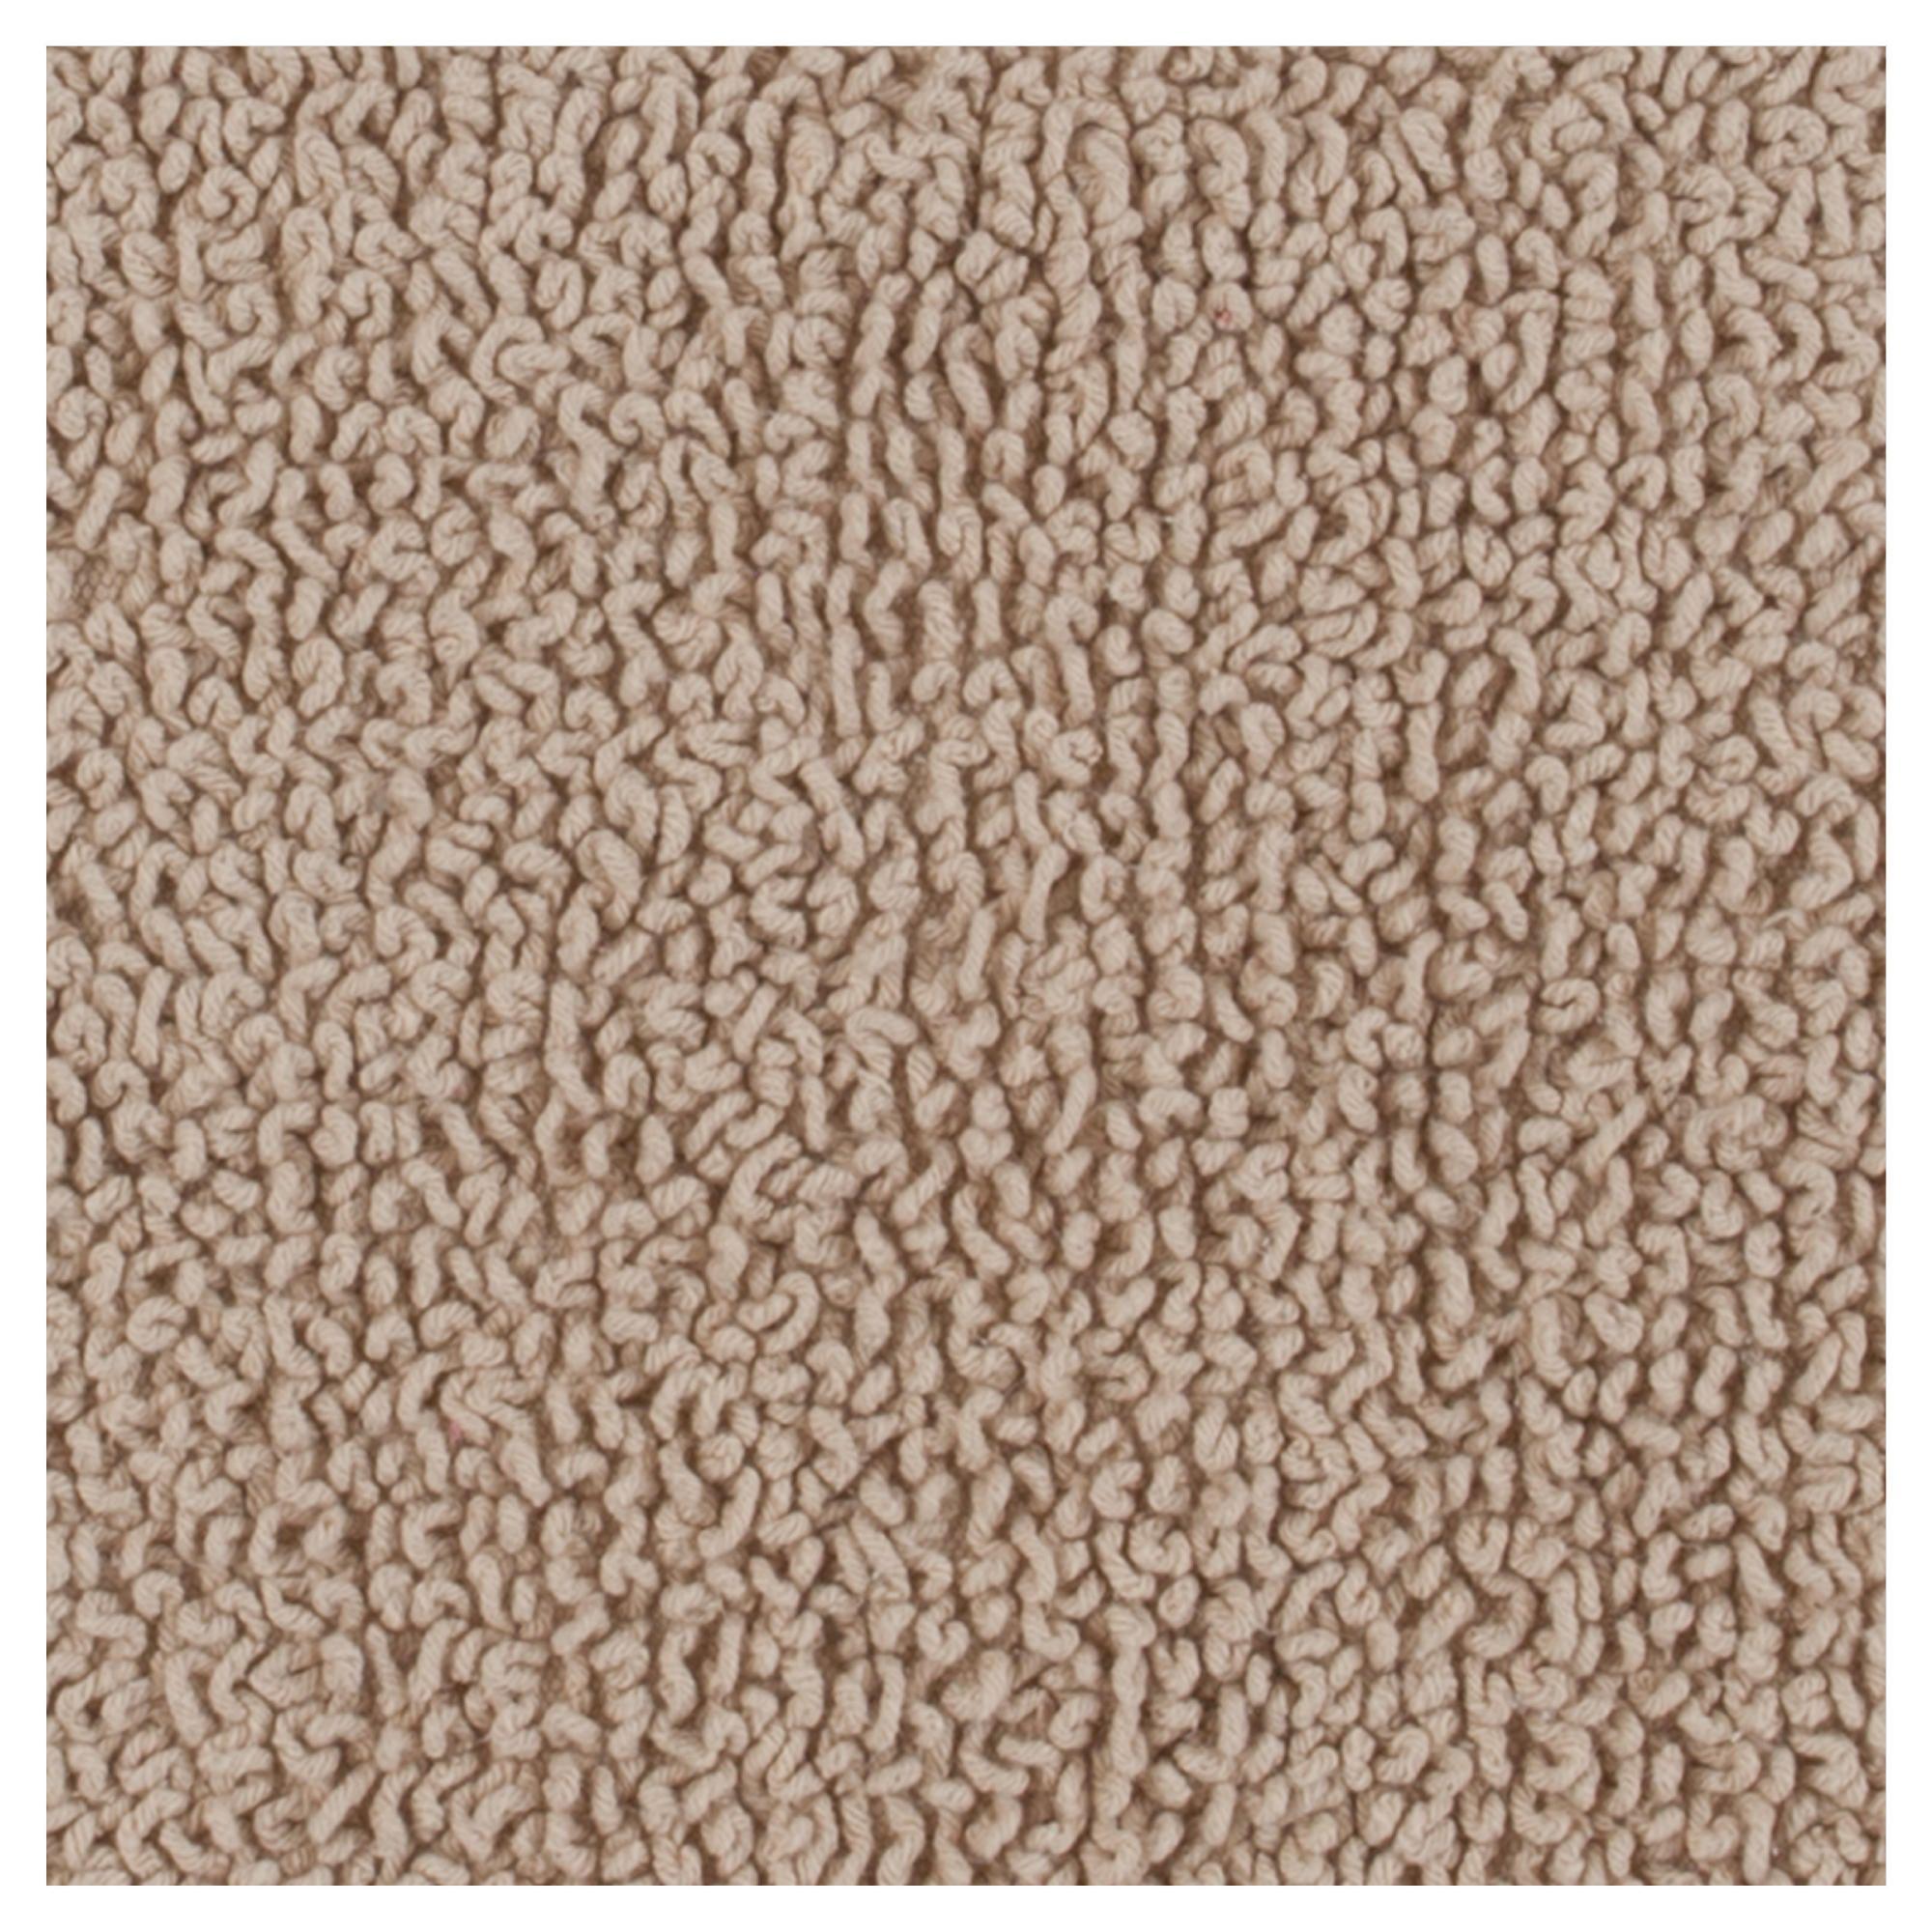 tesco direct tesco standard reversible bath mat taupe. Black Bedroom Furniture Sets. Home Design Ideas